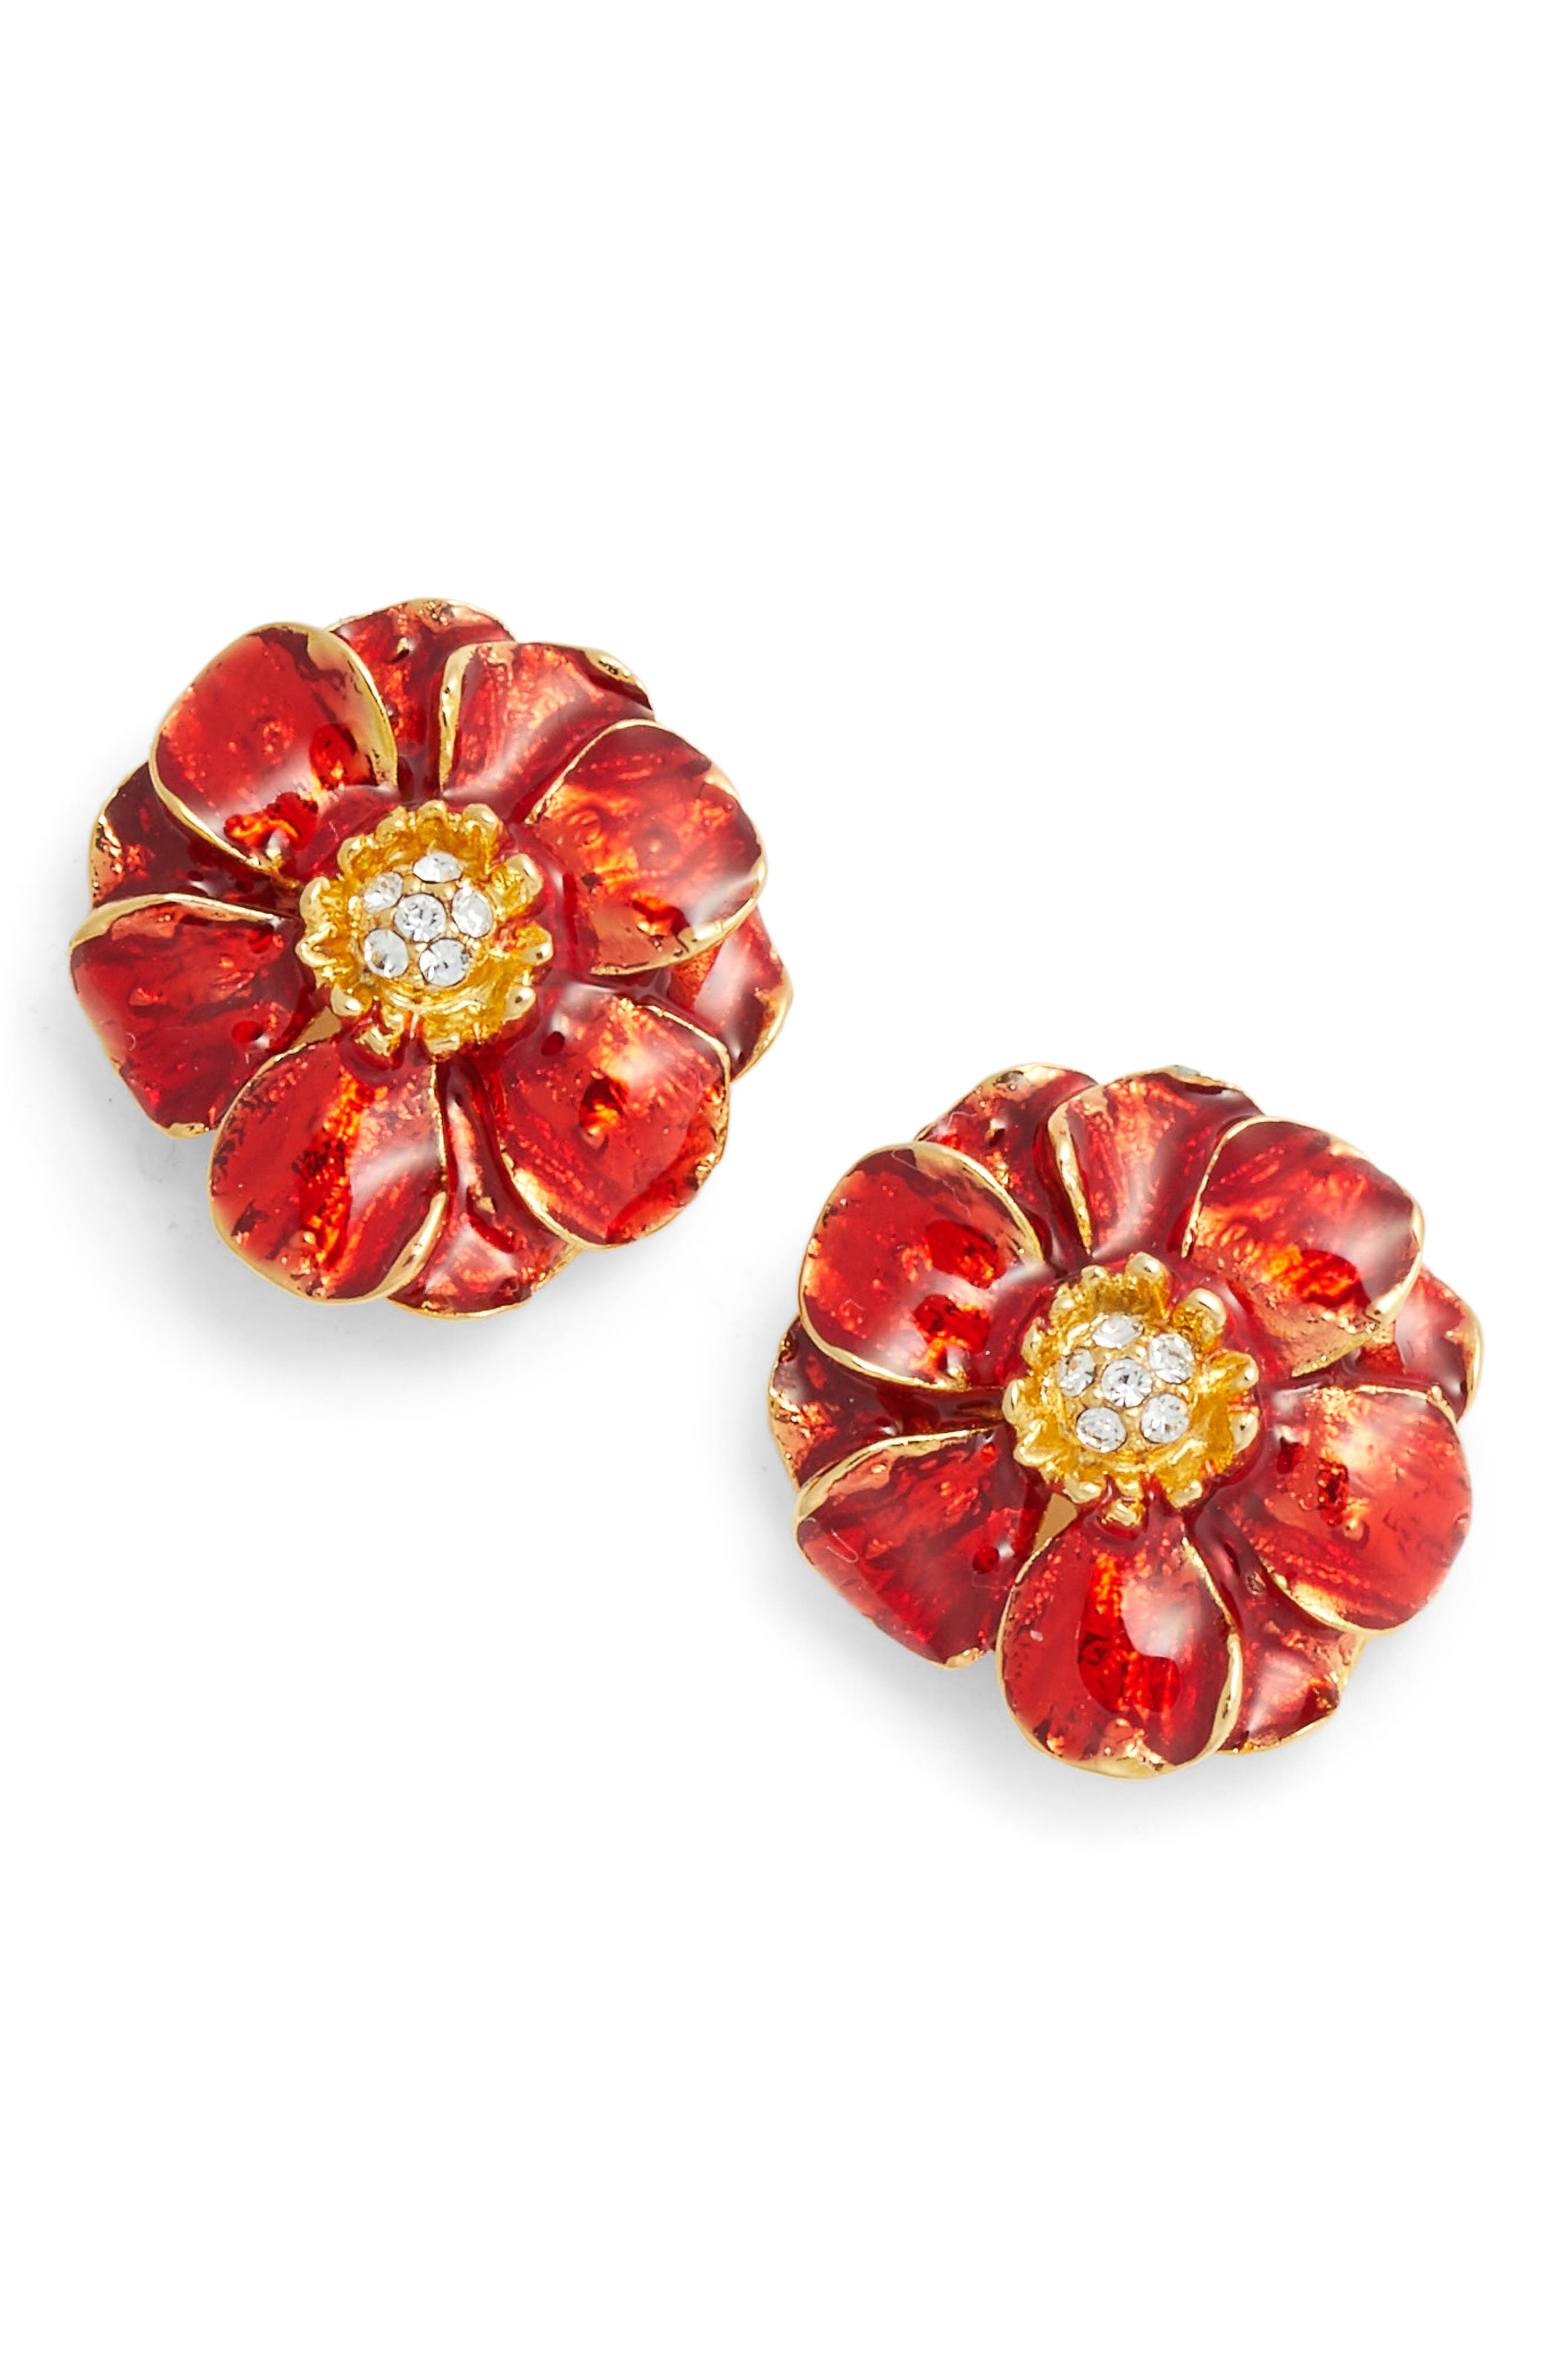 Goldtone Les Roses Earrings,                         Main,                         color, Multi